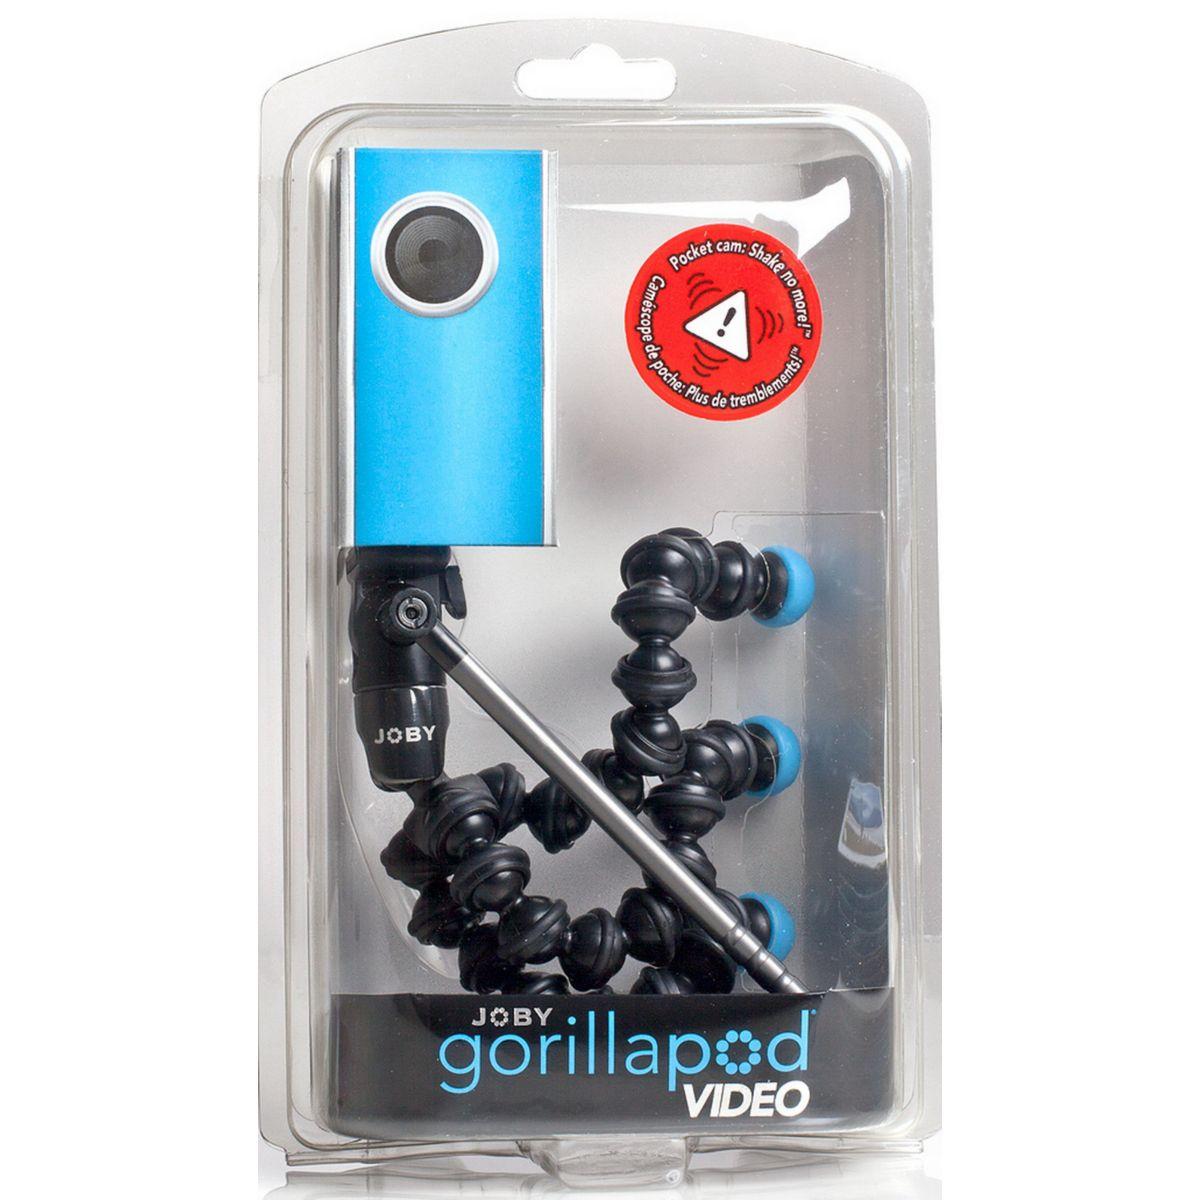 Pied gorillapod tr�pied vid�o - 5% de remise imm�diate avec le code : wd5 (photo)